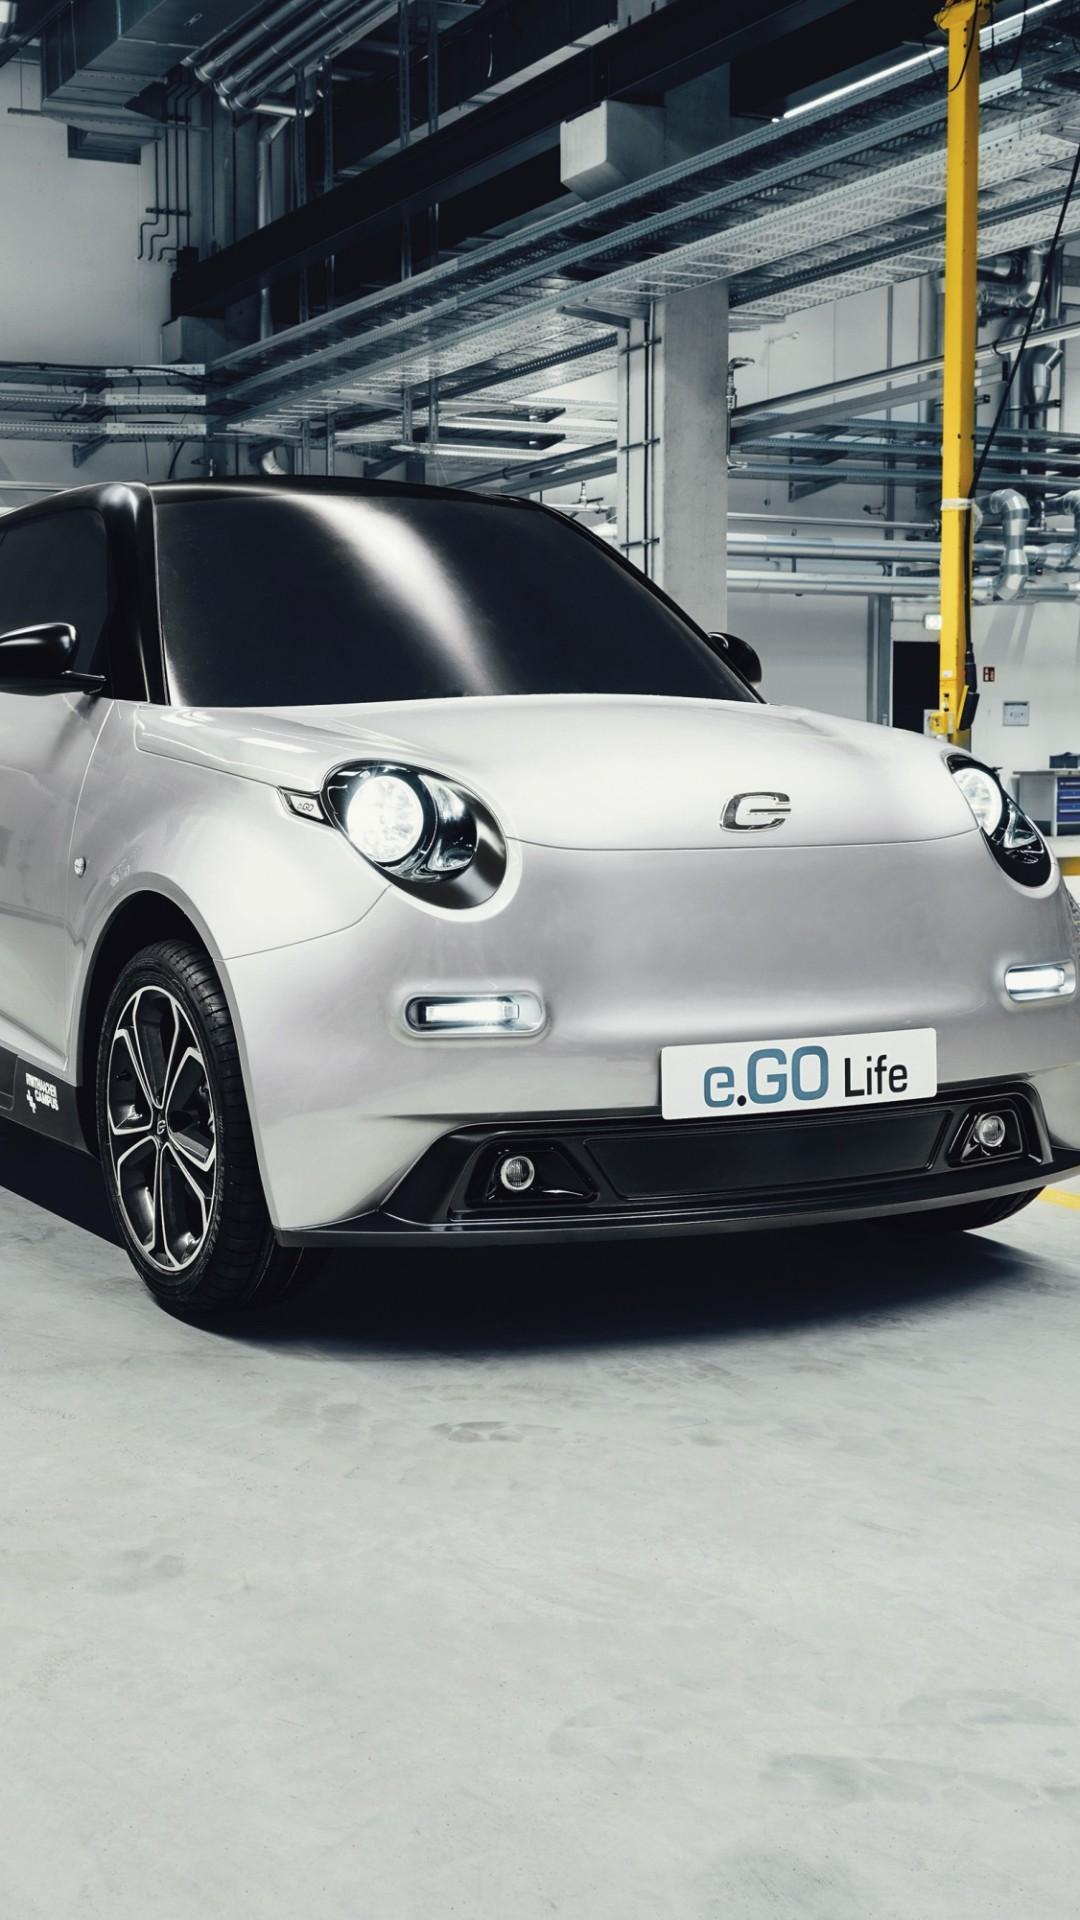 Wallpaper E Go Life Electric Cars Concept Eco Friendly